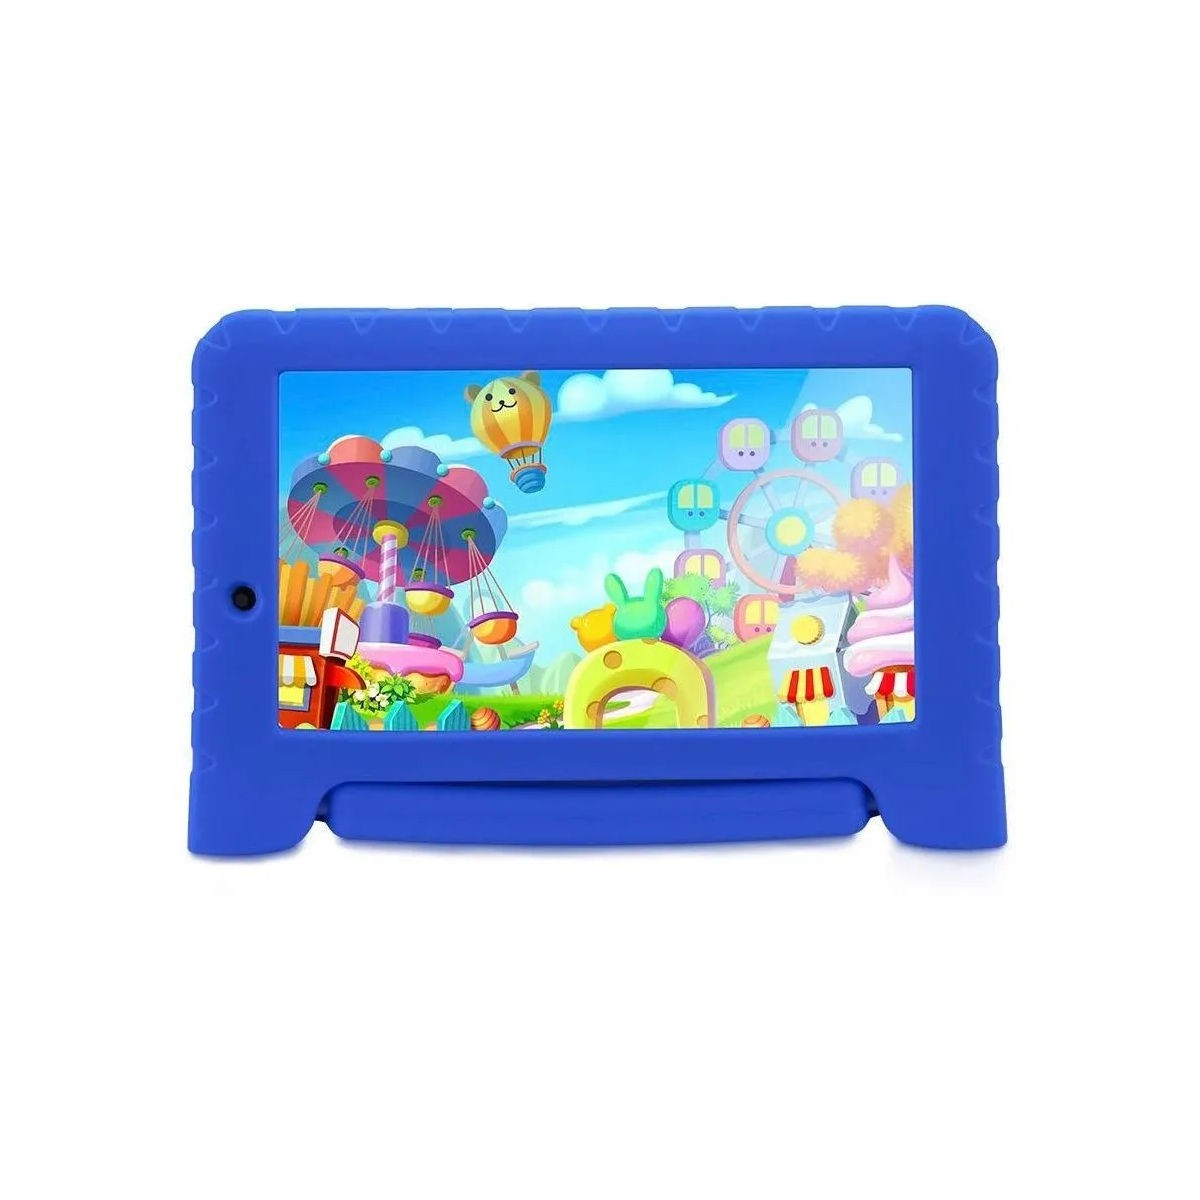 Tablet Kid Pad Plus Azul Infantil 1gb RAM Andoid 7 Wifi 8gb Ref. NB278